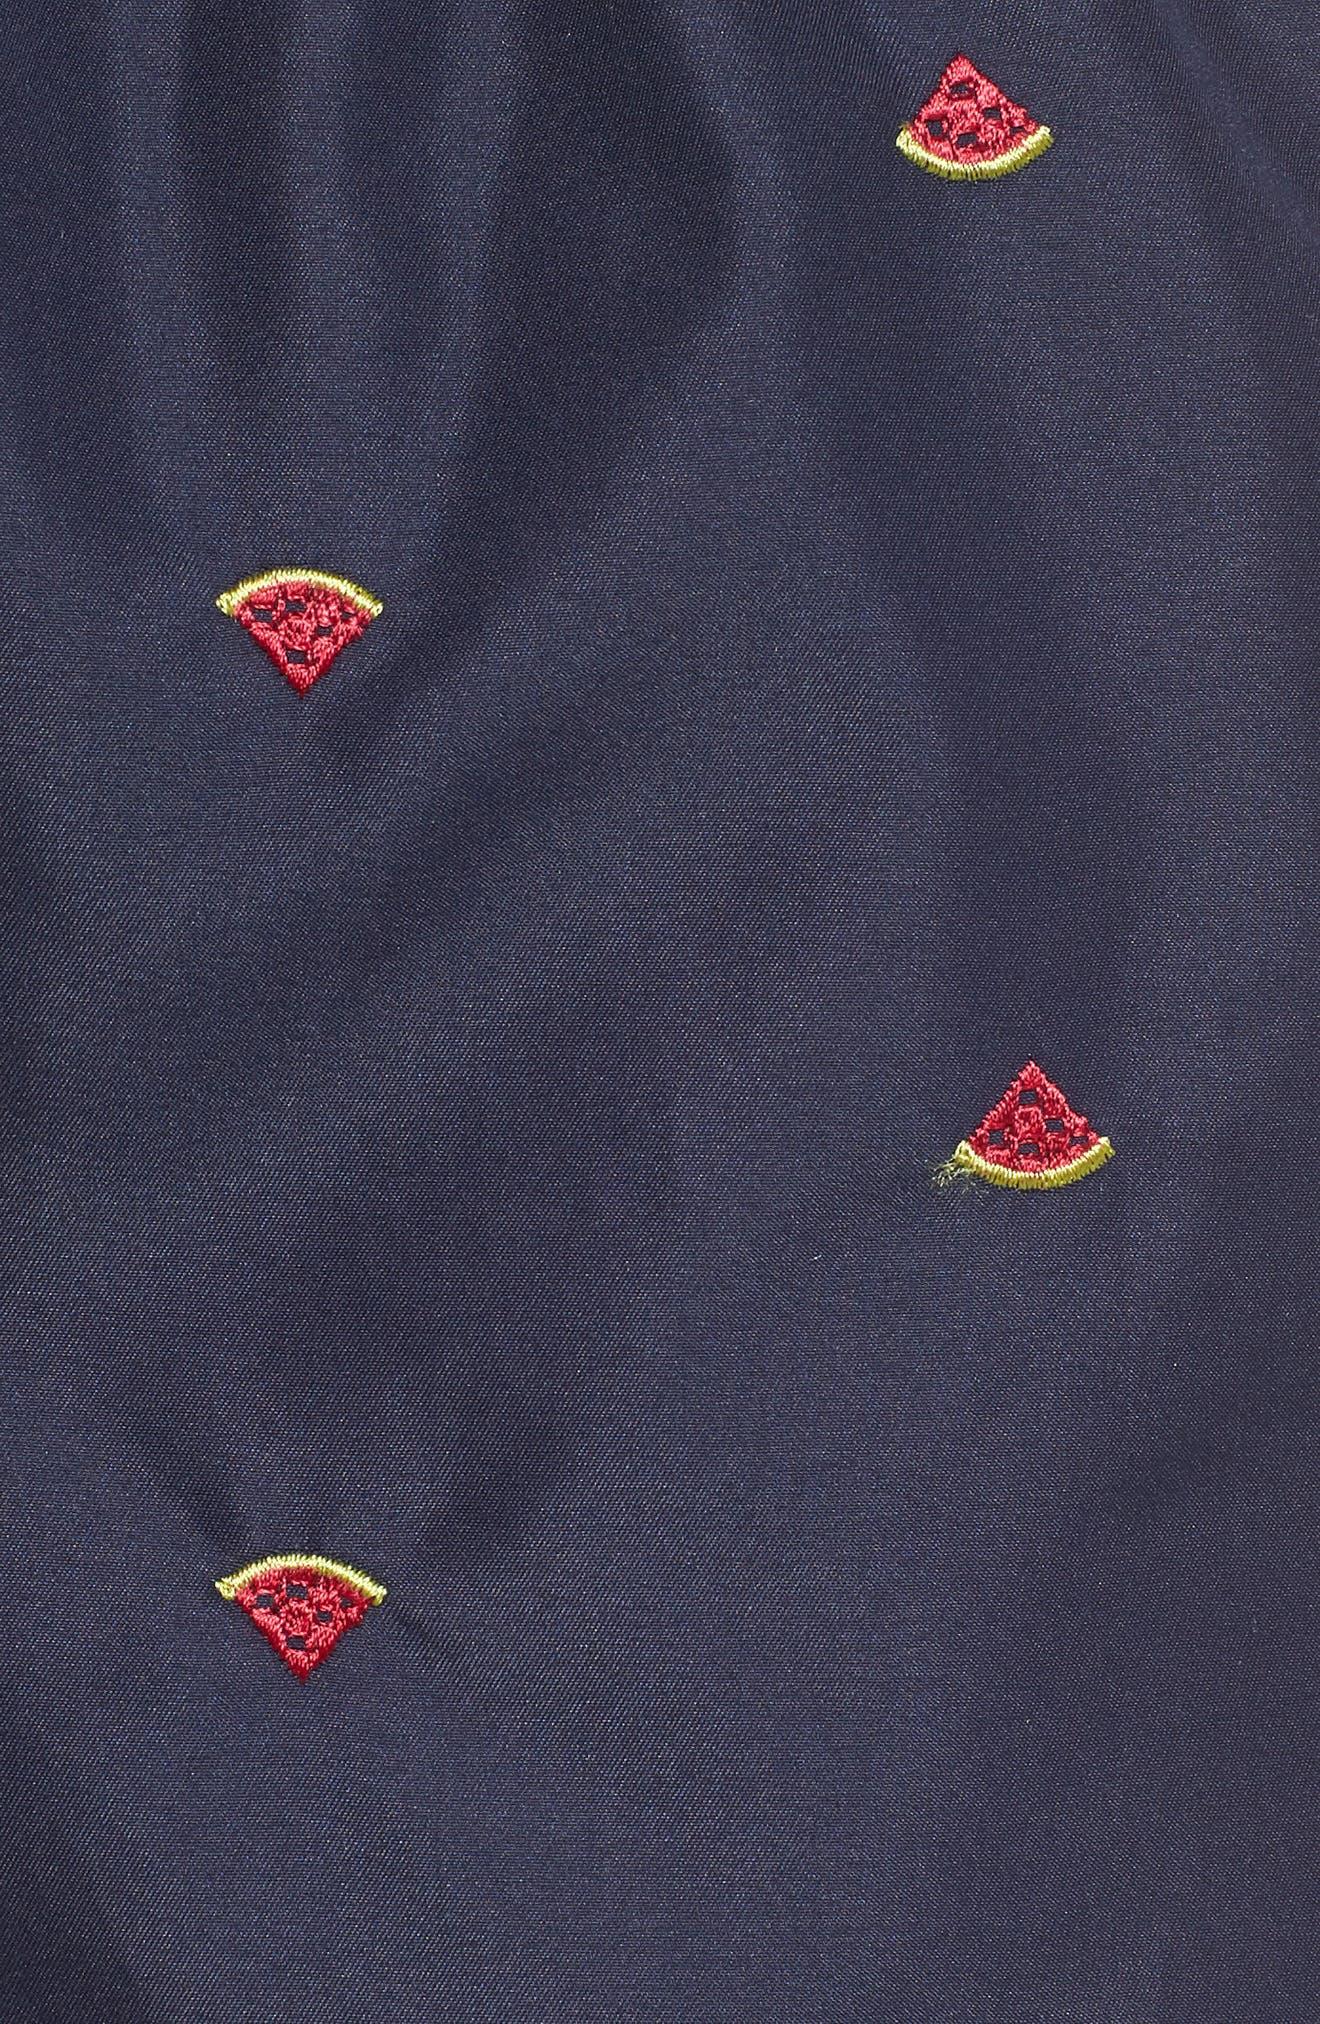 Premium Embroidered Sano Swim Trunks,                             Alternate thumbnail 5, color,                             WATERMELON DRAWING